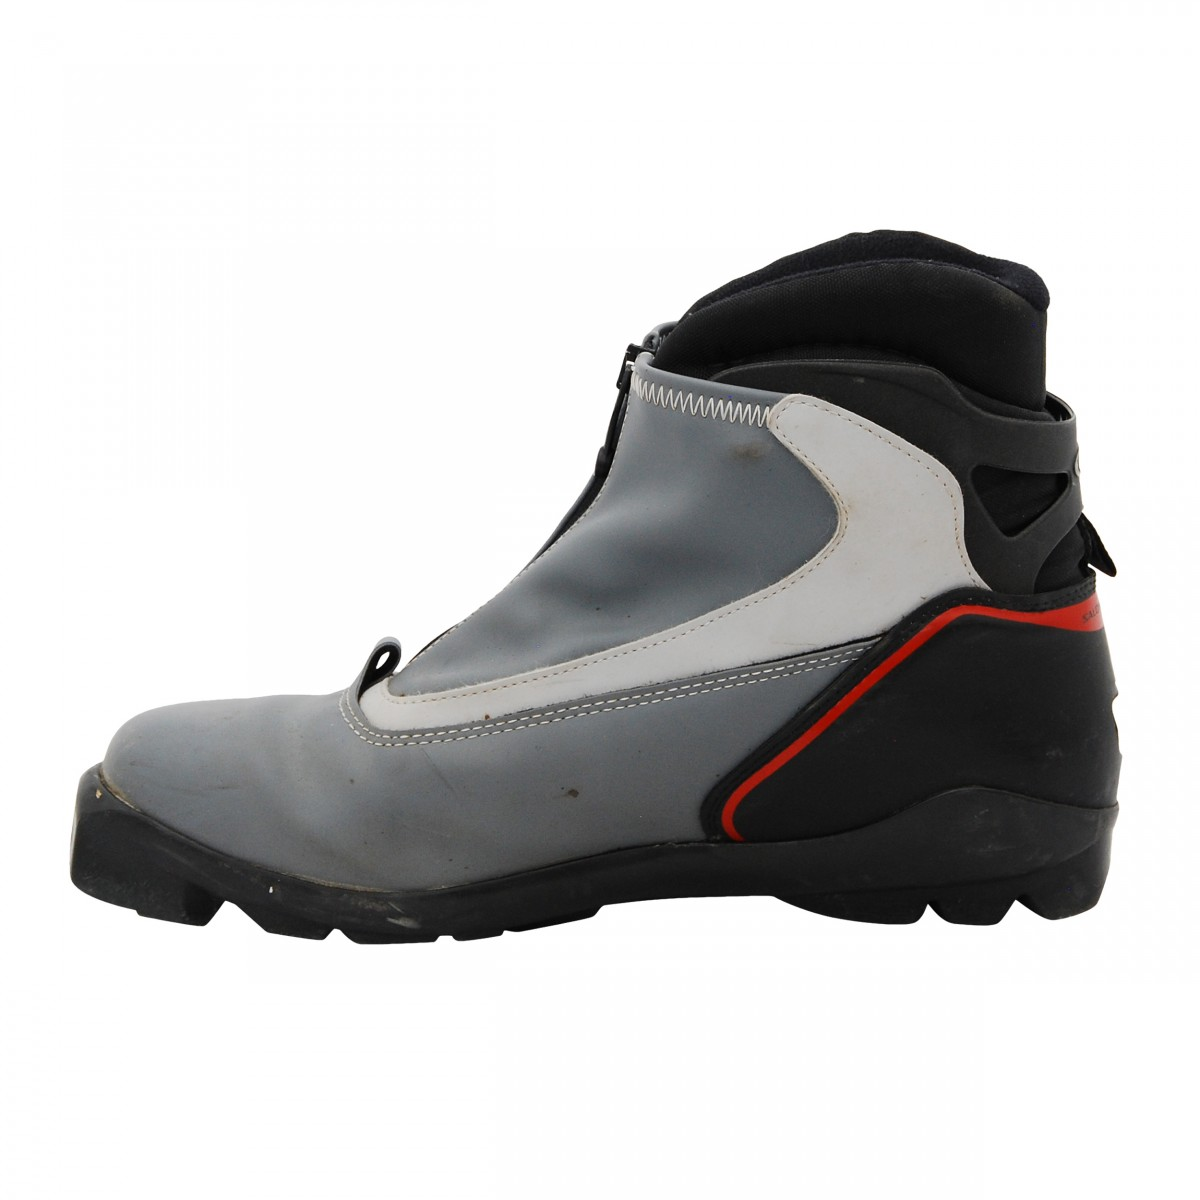 R occasion fond Chaussure de ski Sport SNS Salomon Profil reWdCxoB